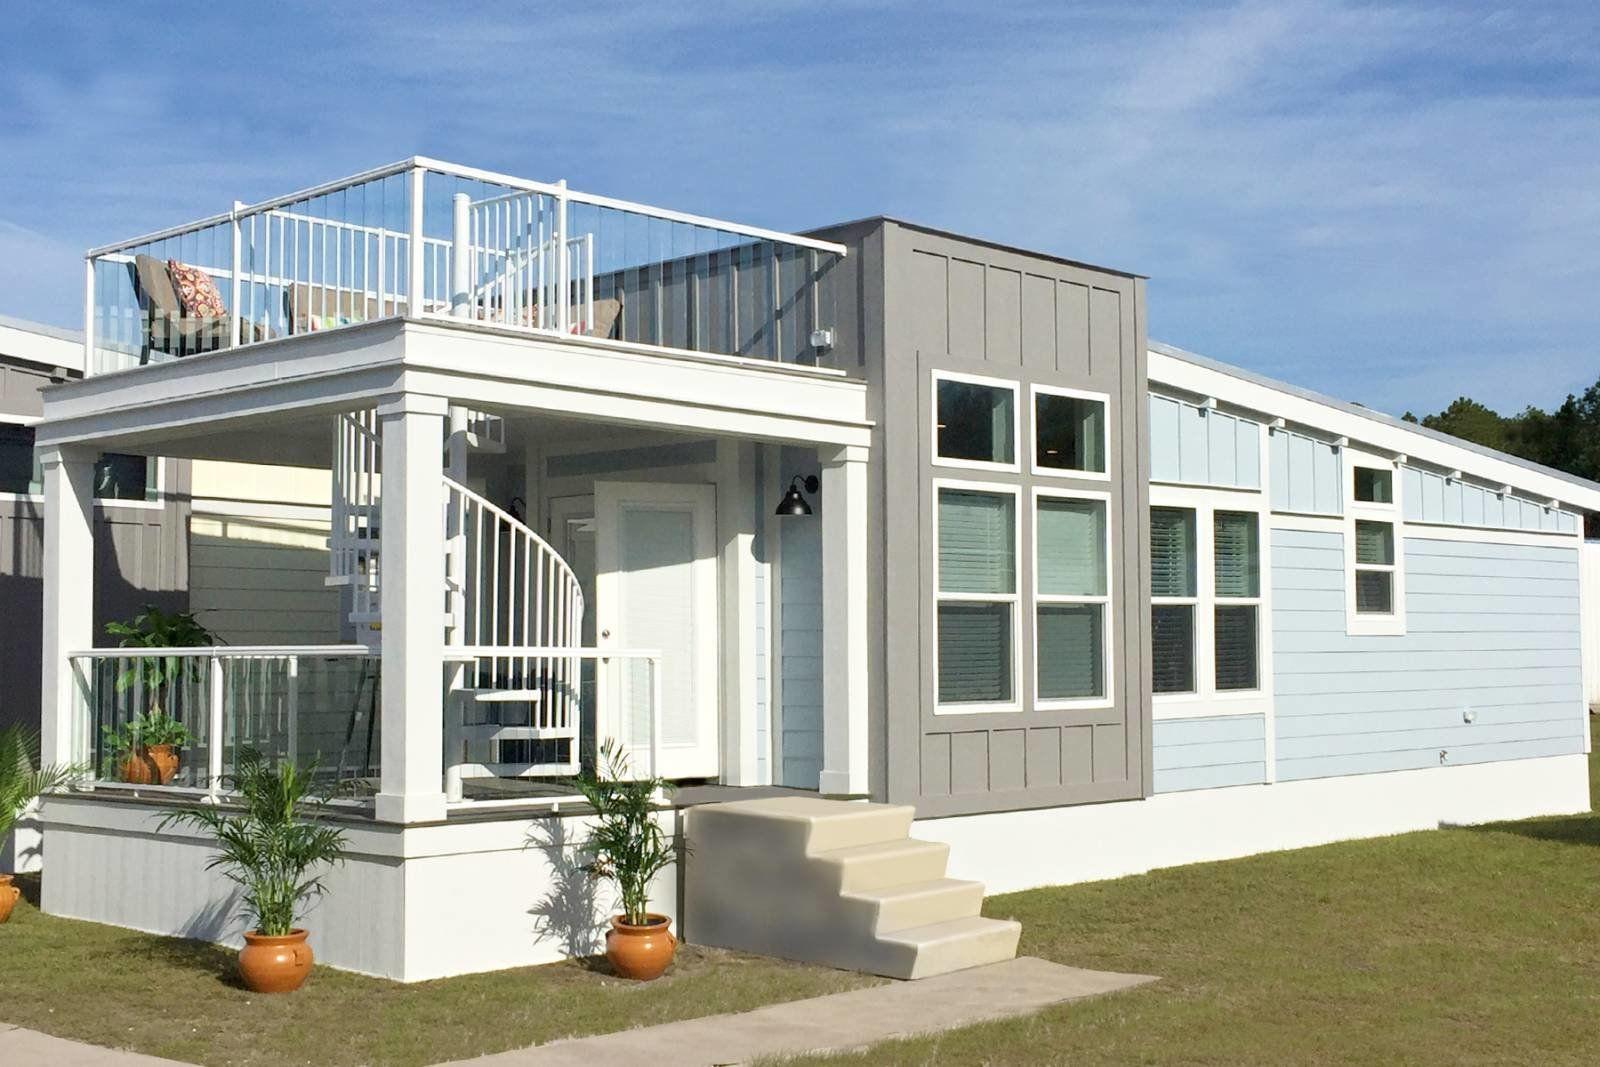 Best Florida Prefab Home Companies In 2020 Prefab Homes Florida Prefab Homes Park Model Homes